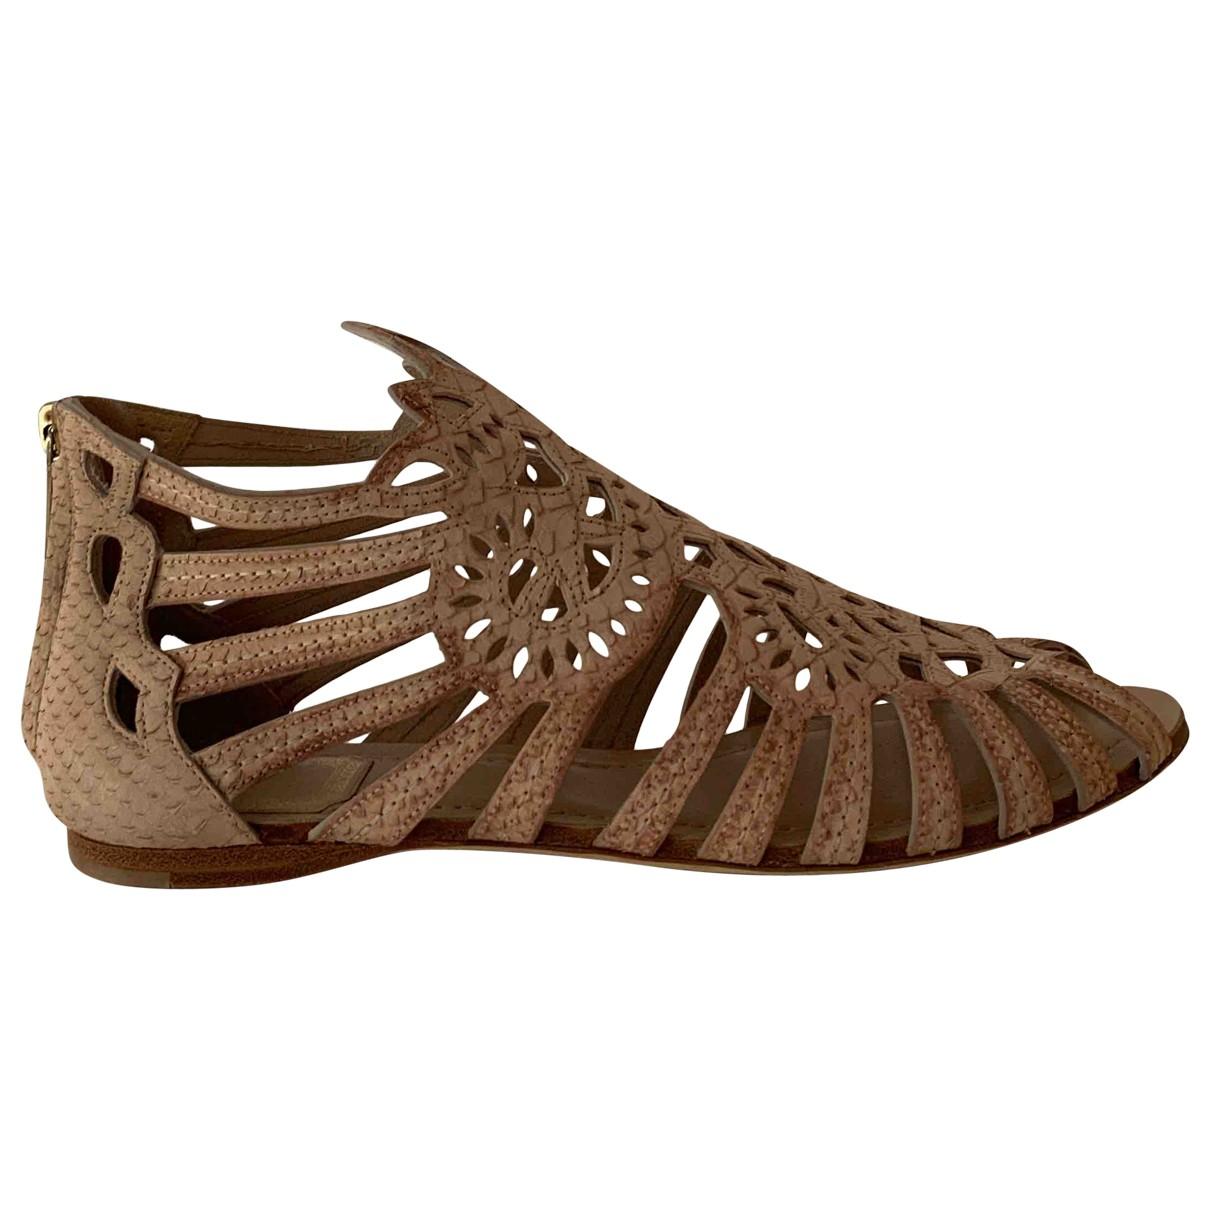 Dior \N Beige Leather Sandals for Women 38.5 EU